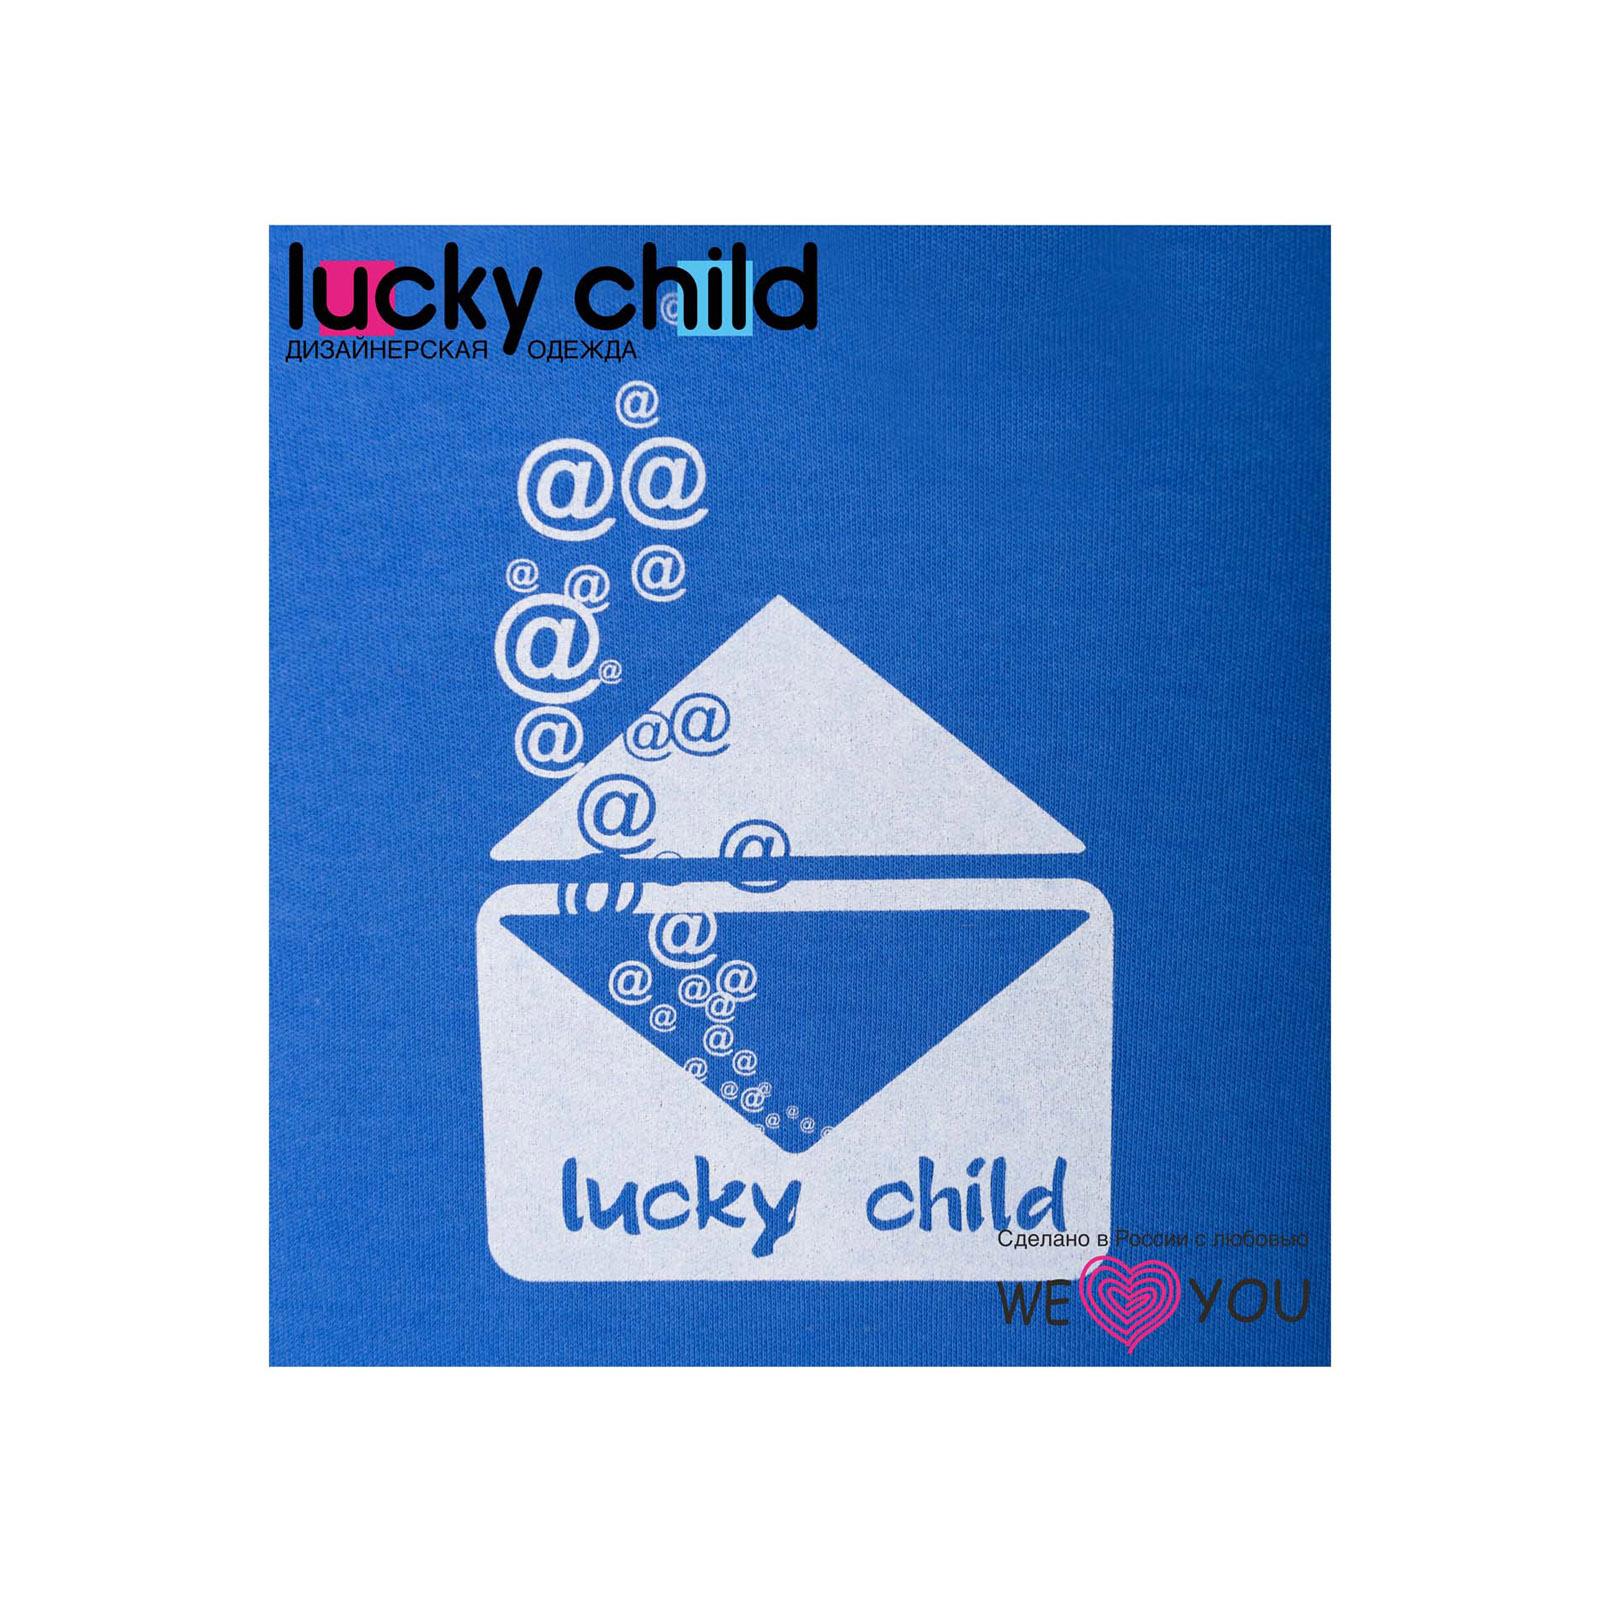 ��������� Lucky Child ��������� ���� ����� � ����� ������ 80